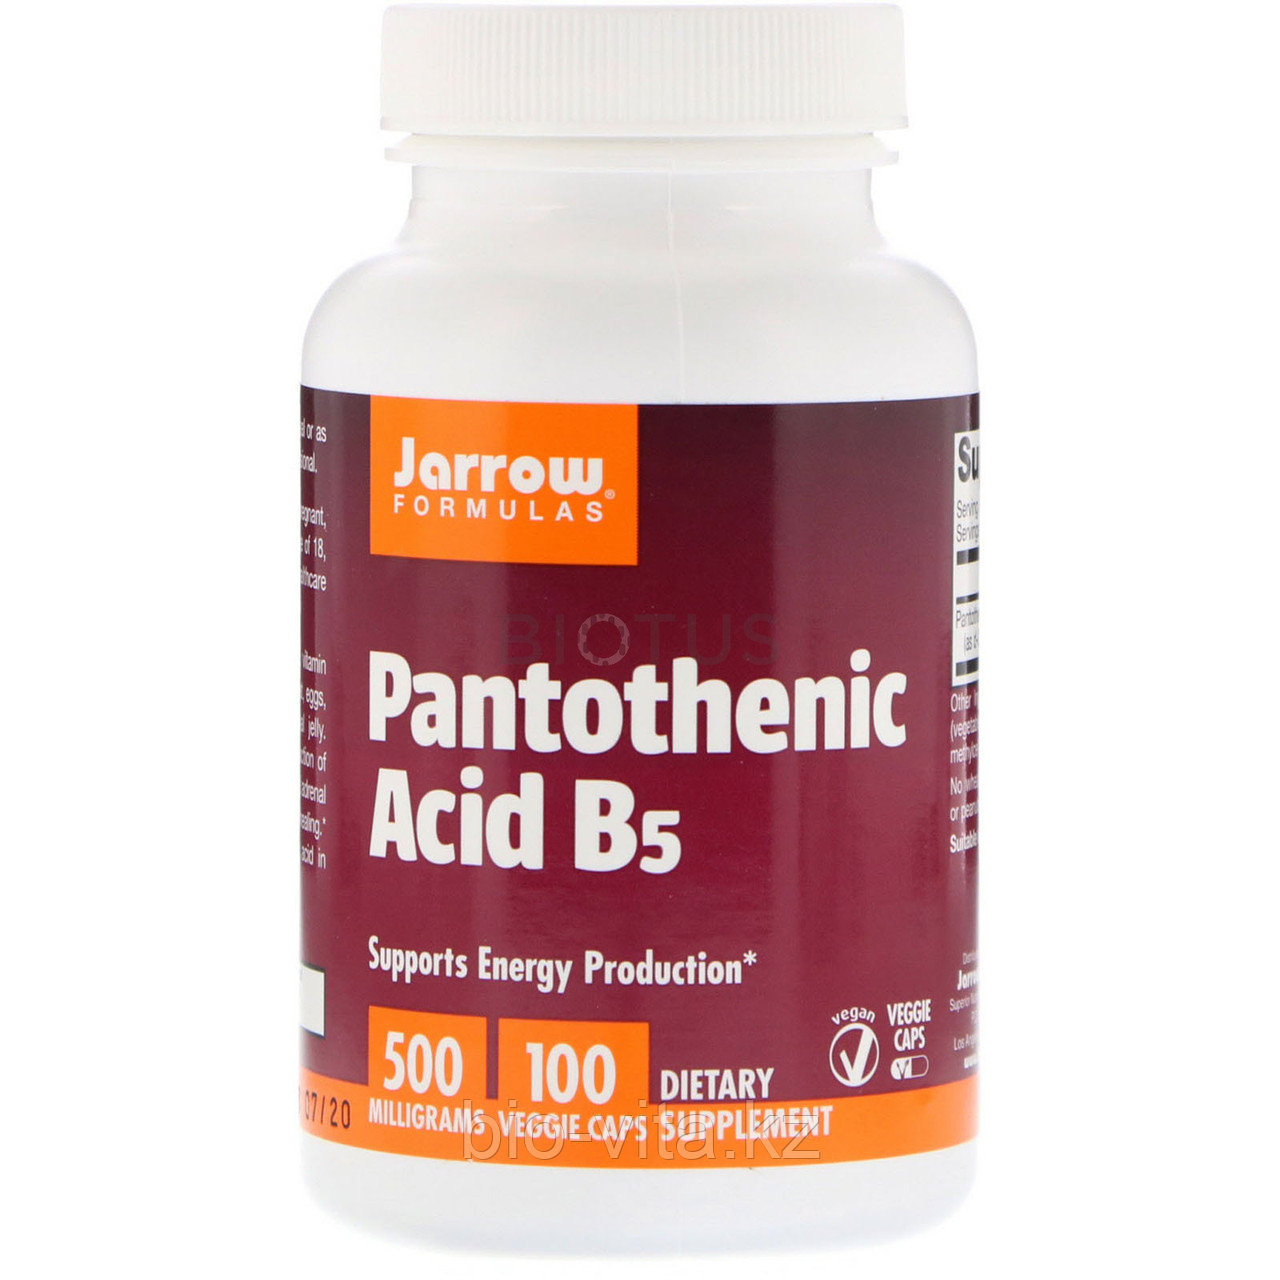 Pantothenic Acid,Пантотеновая кислота Витамин В 5. 500 mg, 100 капсул. Jarrow